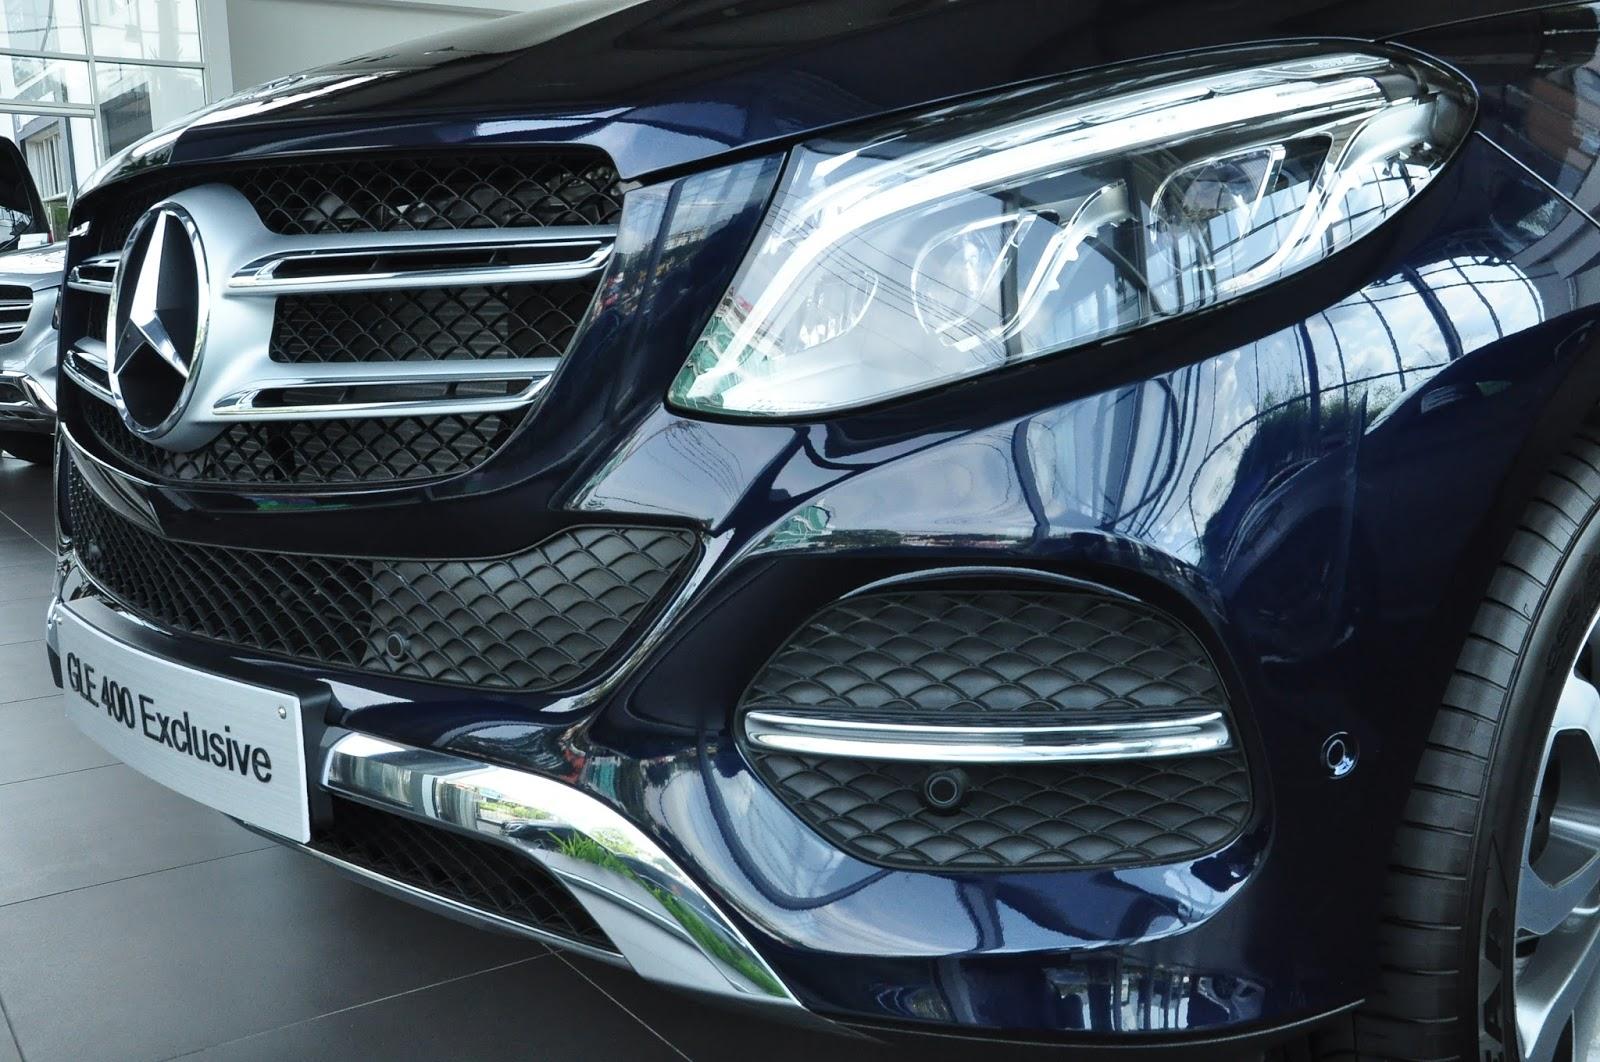 Xe Mercedes GLE 400 Exclusive màu xanh 02